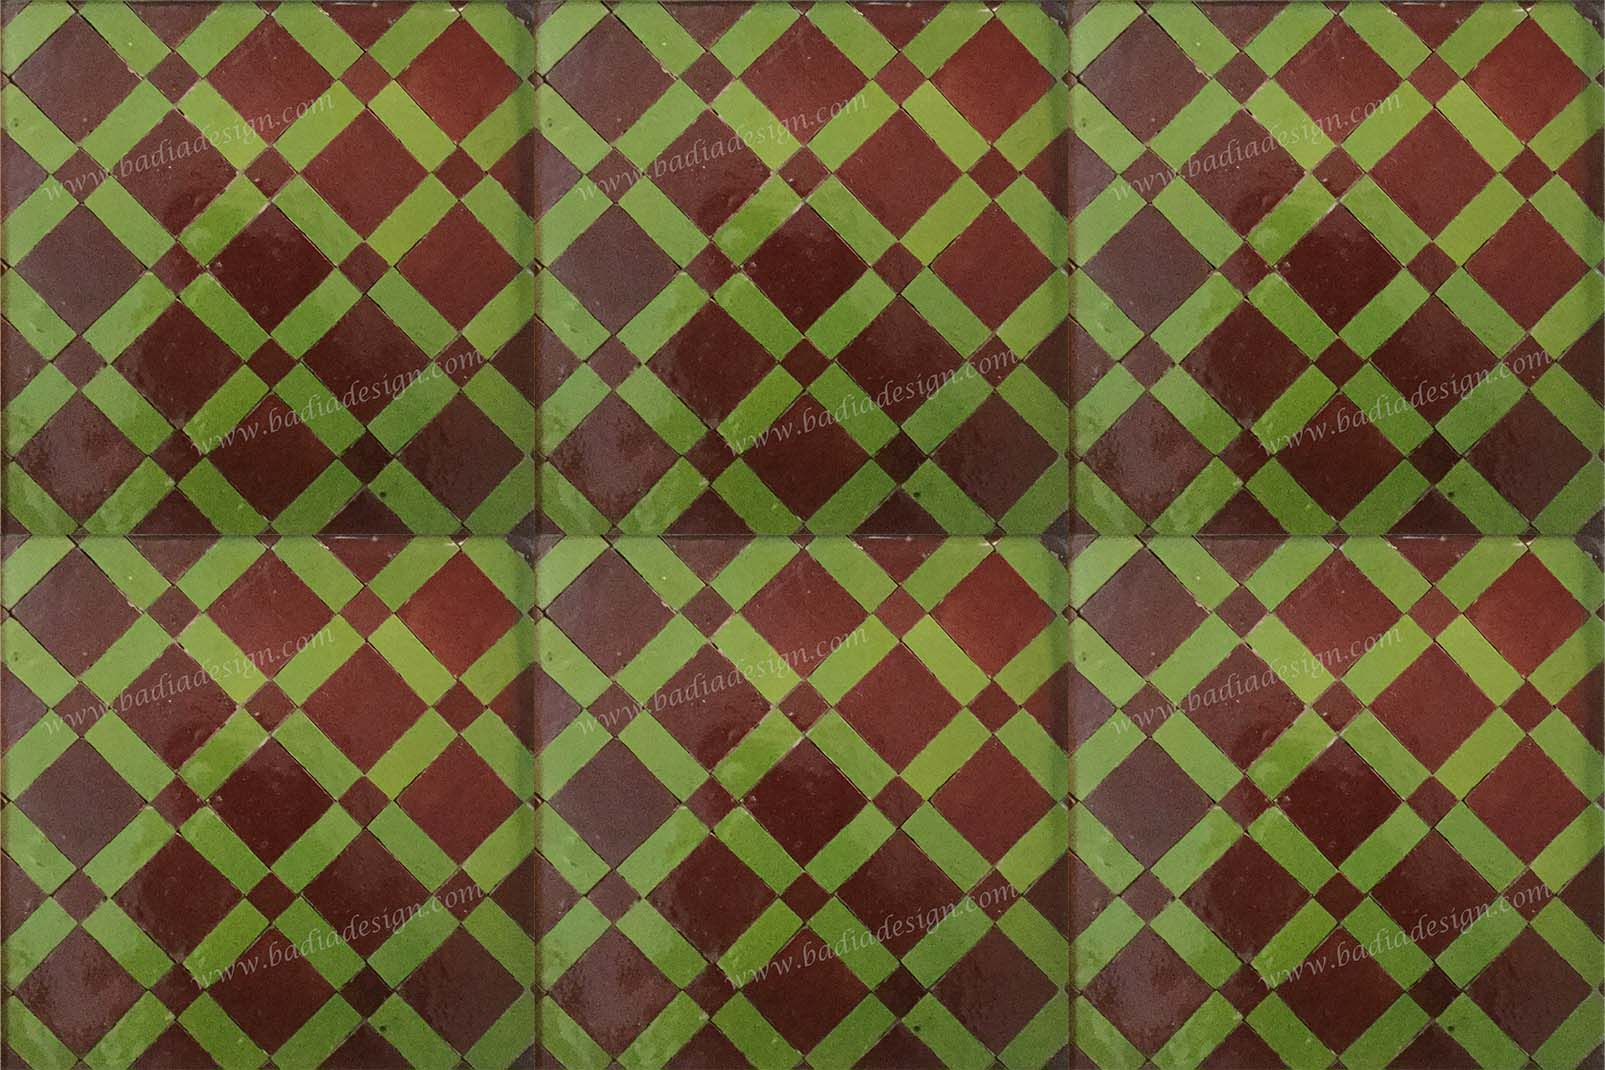 Moroccan Mosaic Ceramic Tile